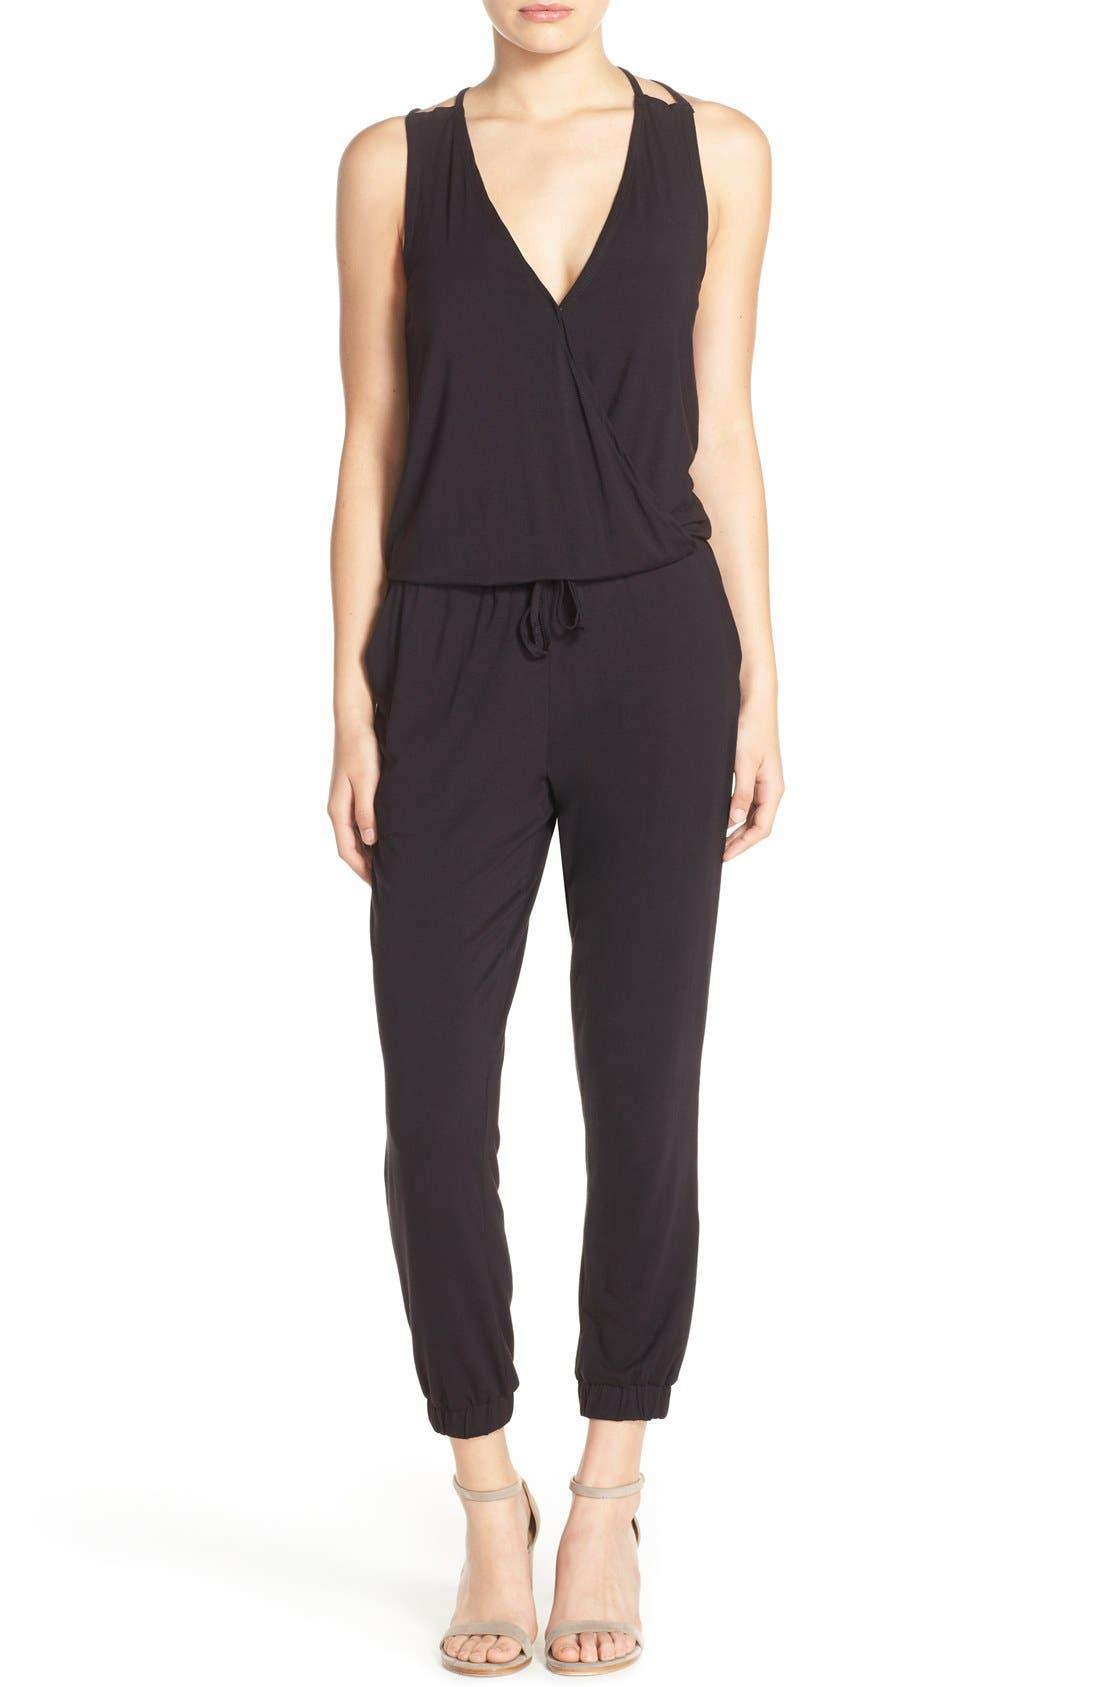 Alternate Image 1 Selected - BB Dakota 'Milligan' Sleeveless Jumpsuit